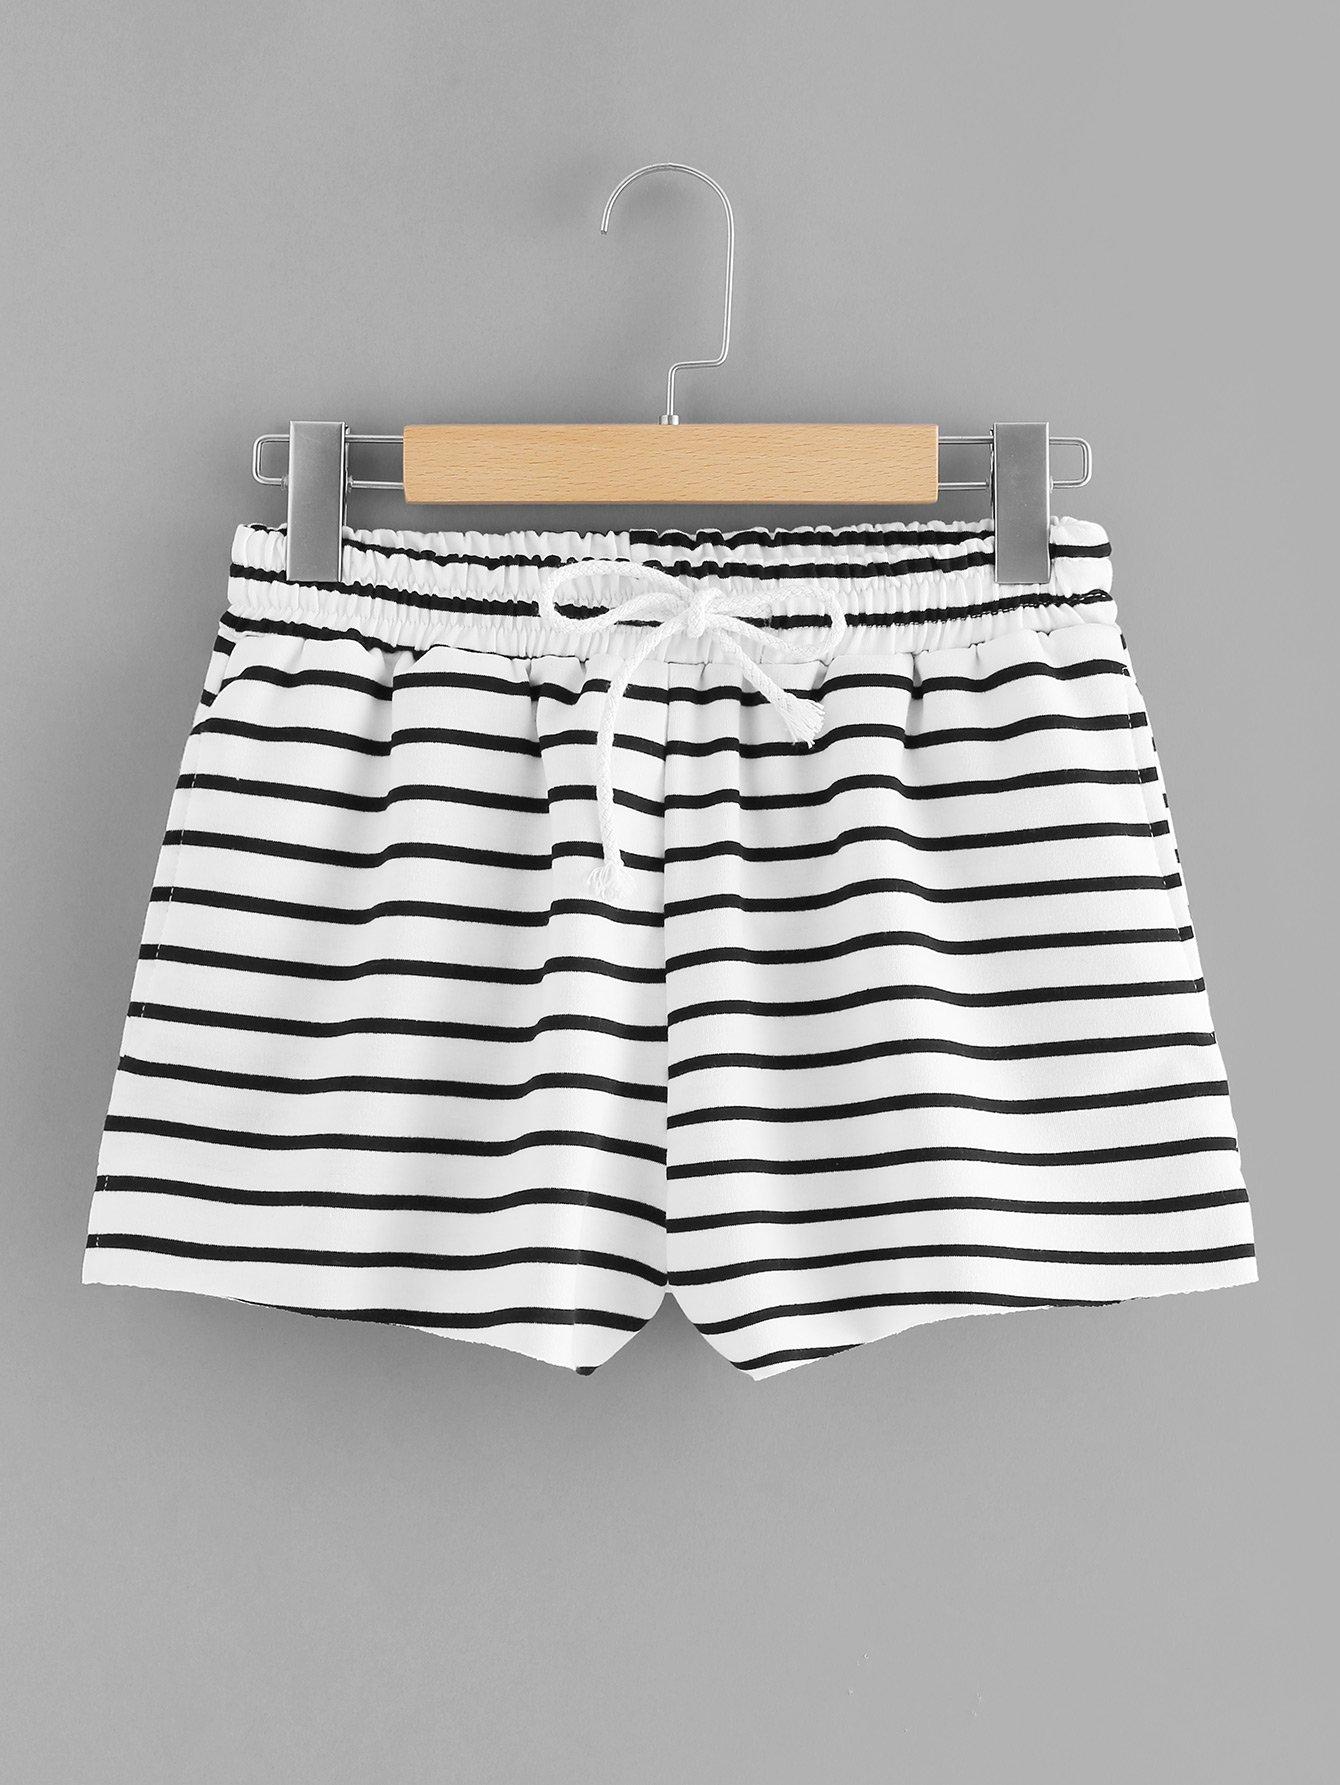 Drawstring Waist Striped Shorts drawstring waist tie dyed shorts